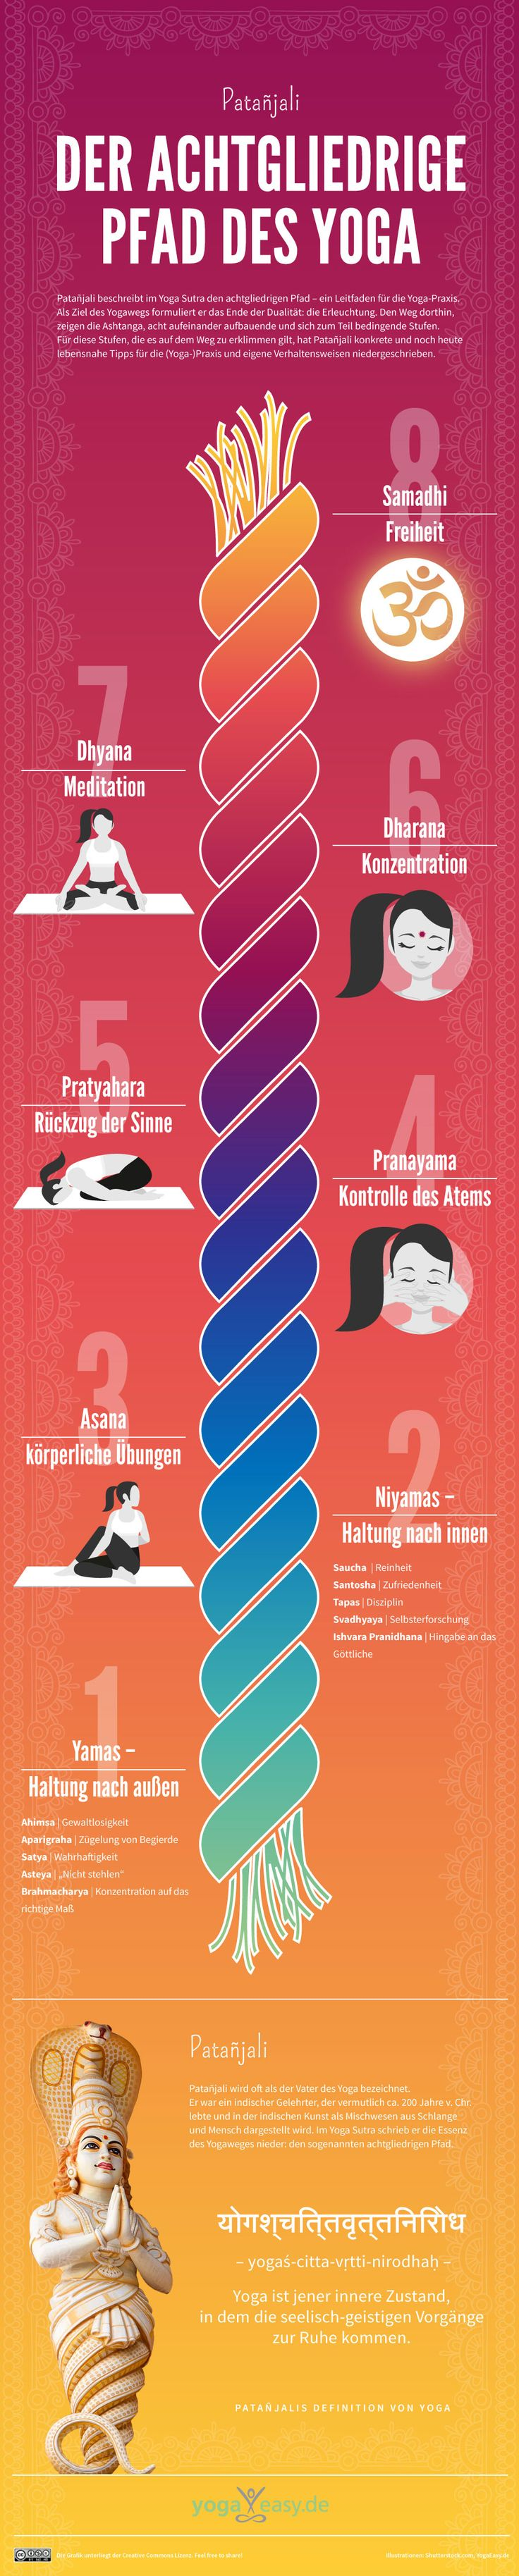 Infografik: Der achtgliedrige Pfad des Patanjali